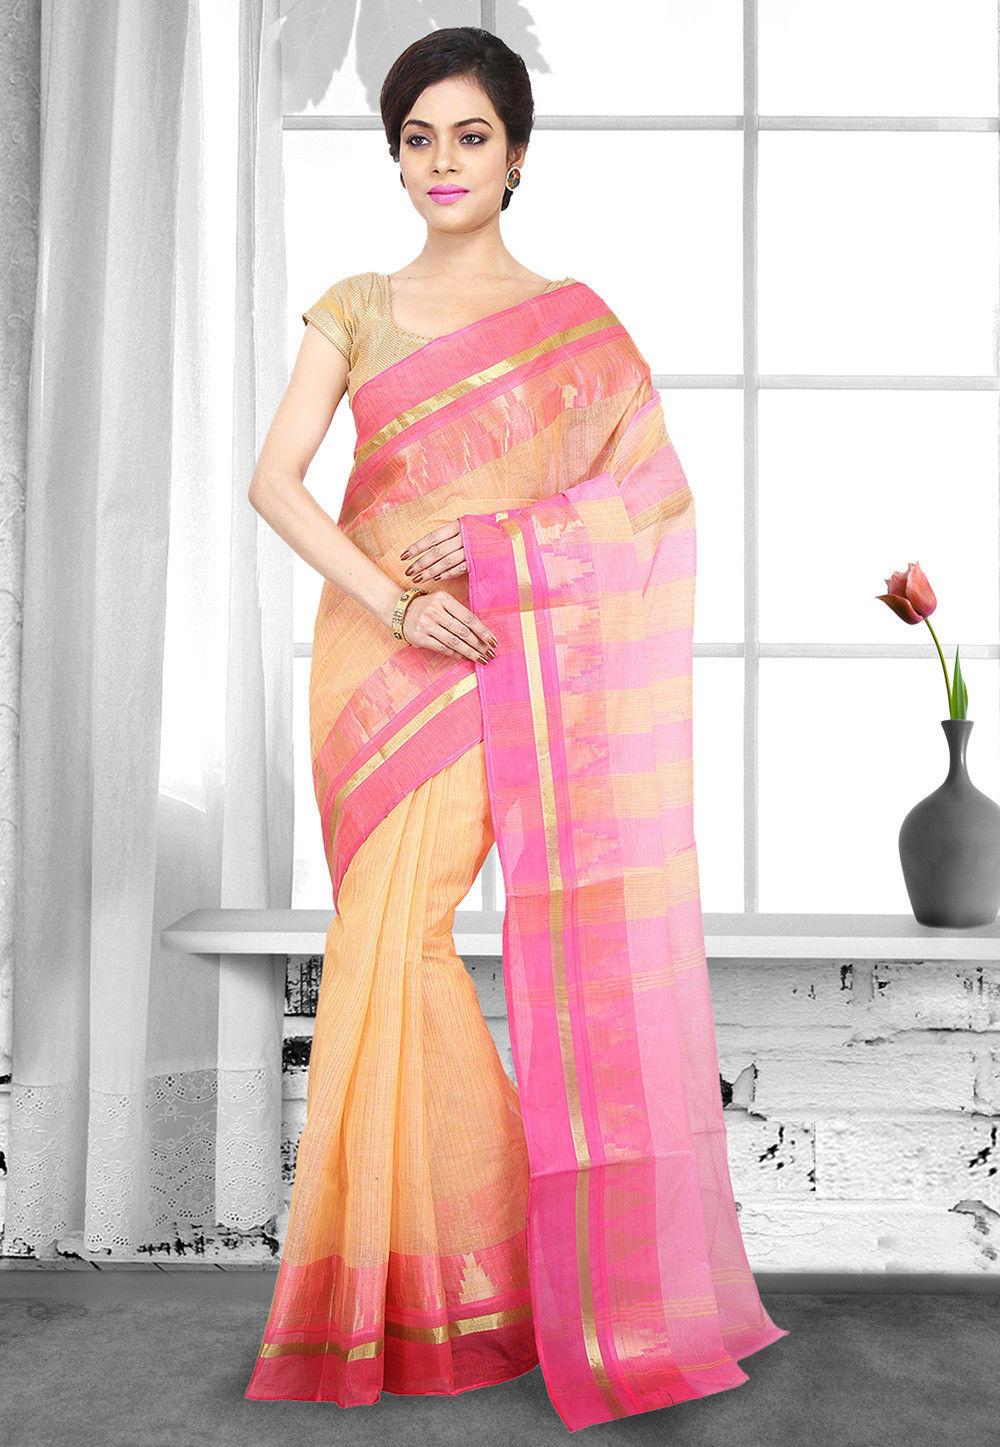 Handloom Cotton Tant Saree in Light Orange